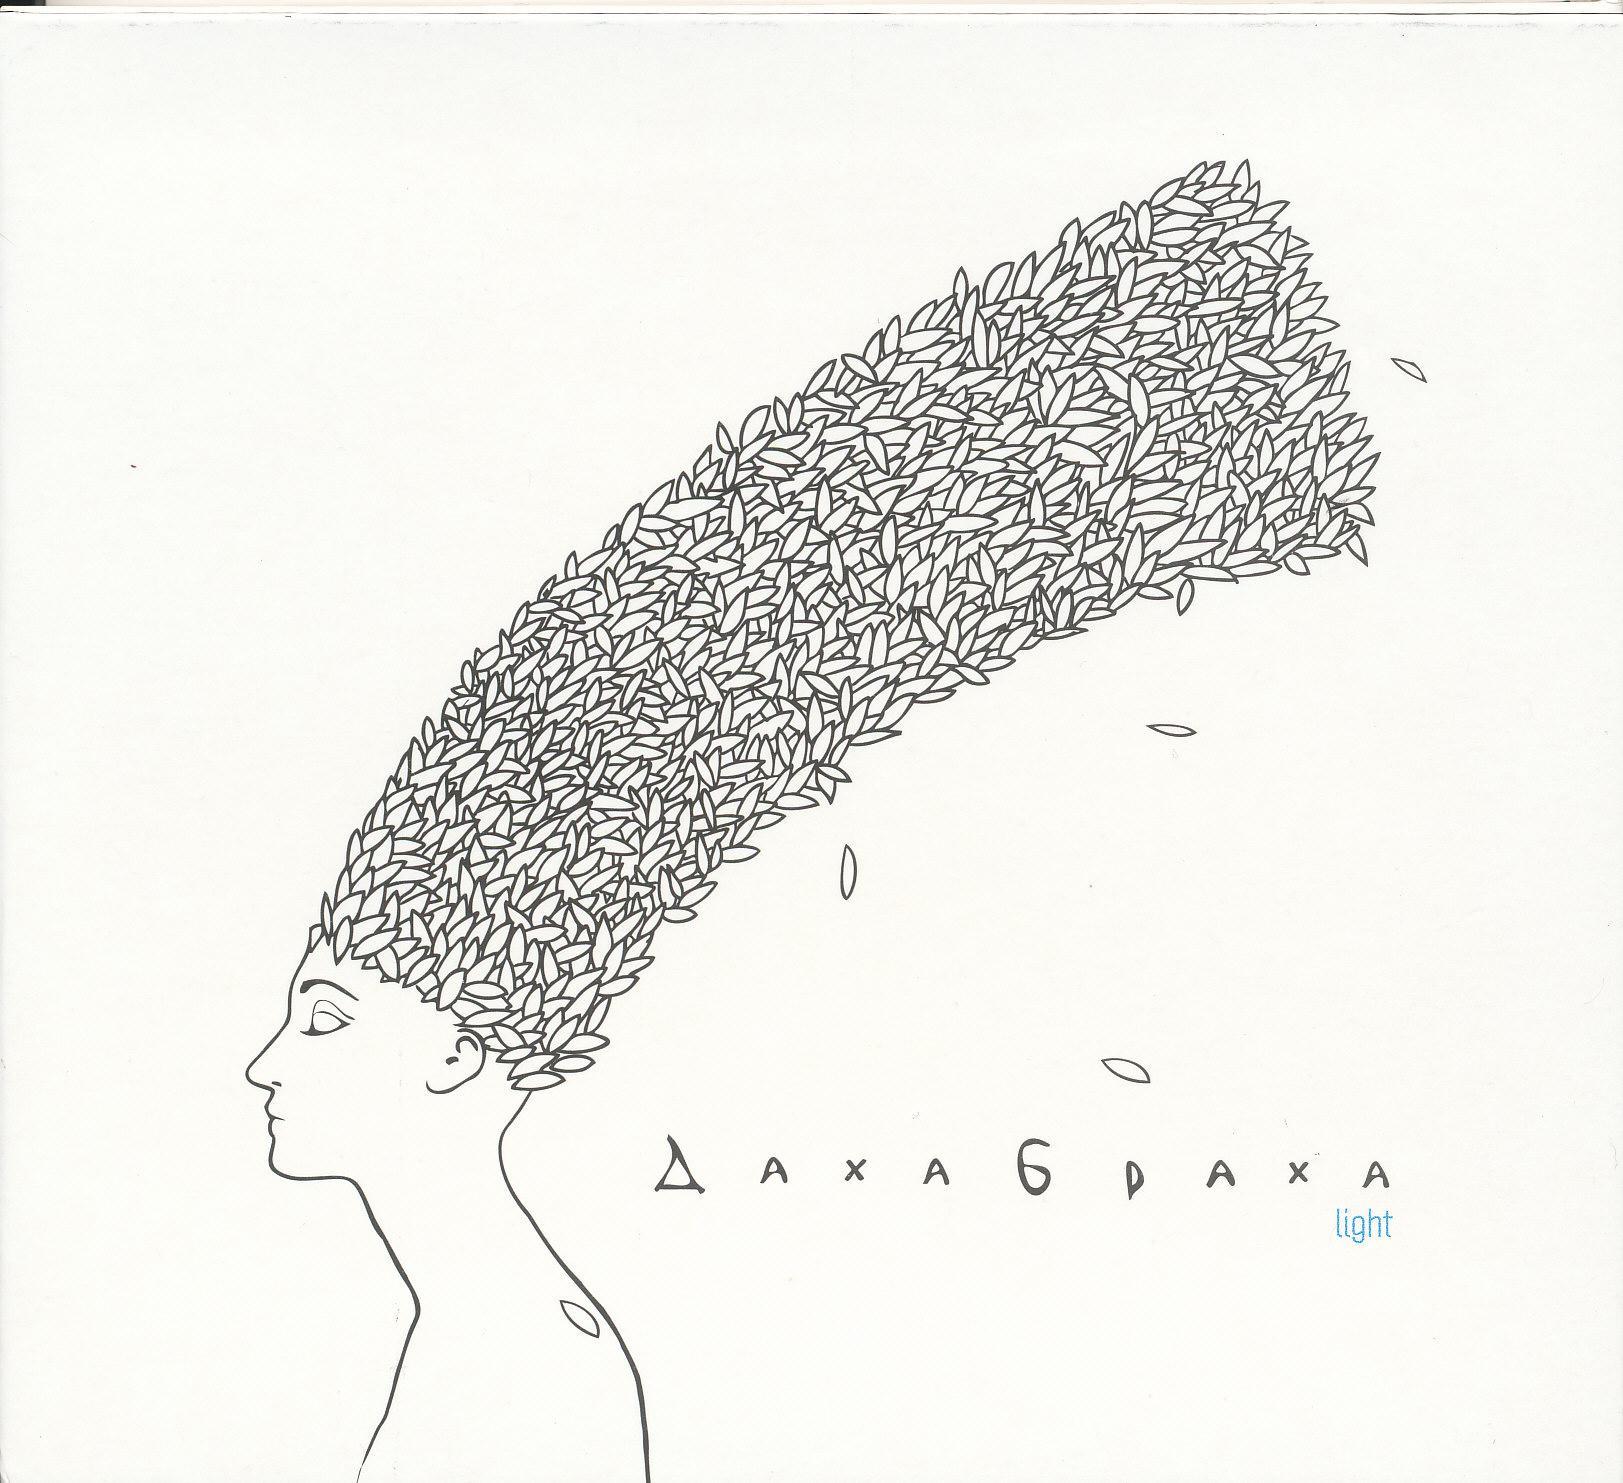 ДахаБраха - Light (2010) (digipak)